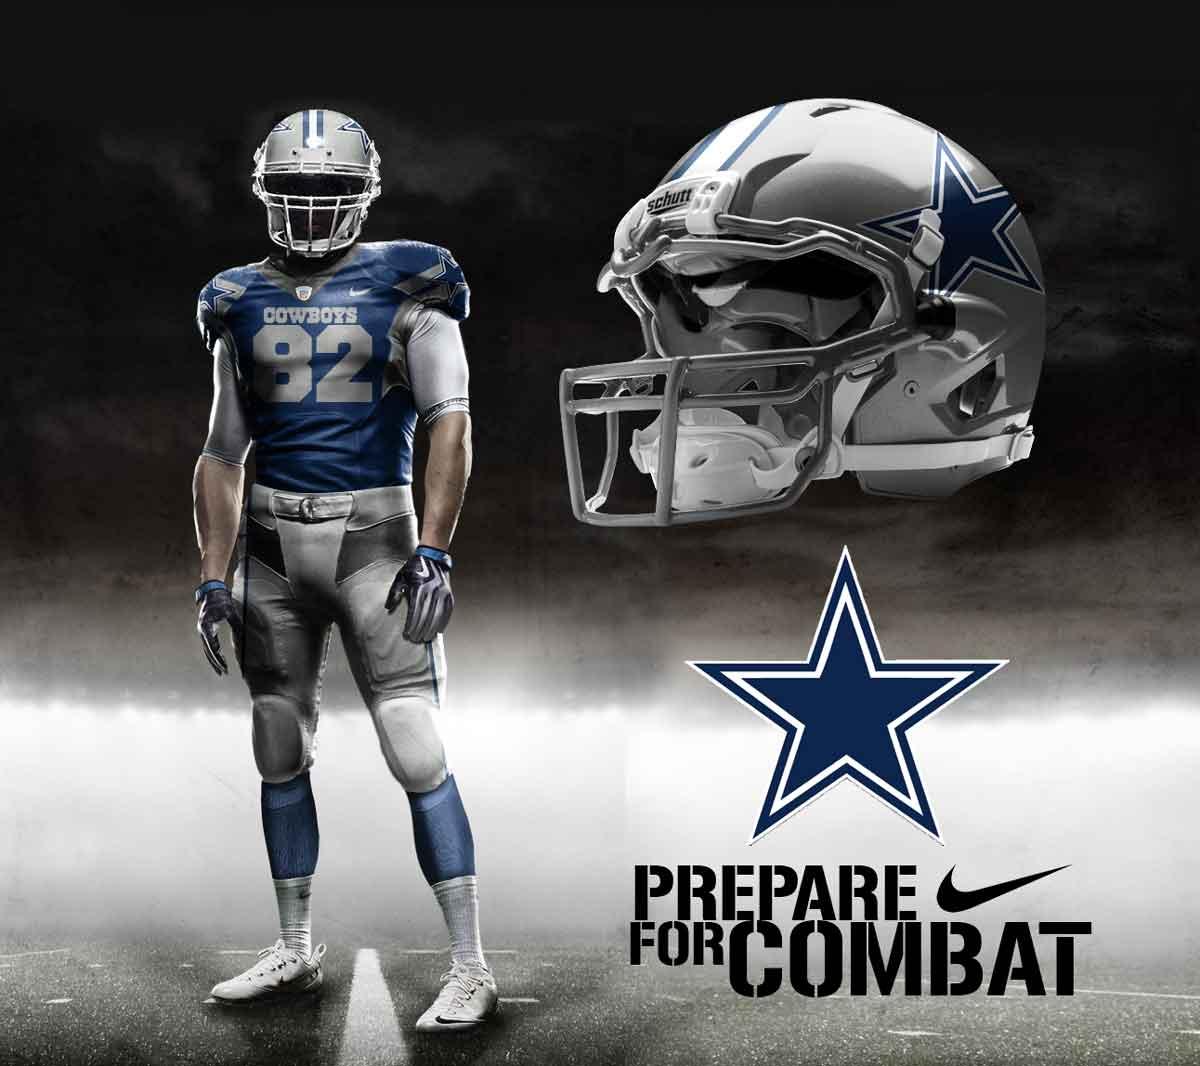 Dallas Cowboys Wallpaper For Iphone - Rhode Island Rams Football Jersey - HD Wallpaper